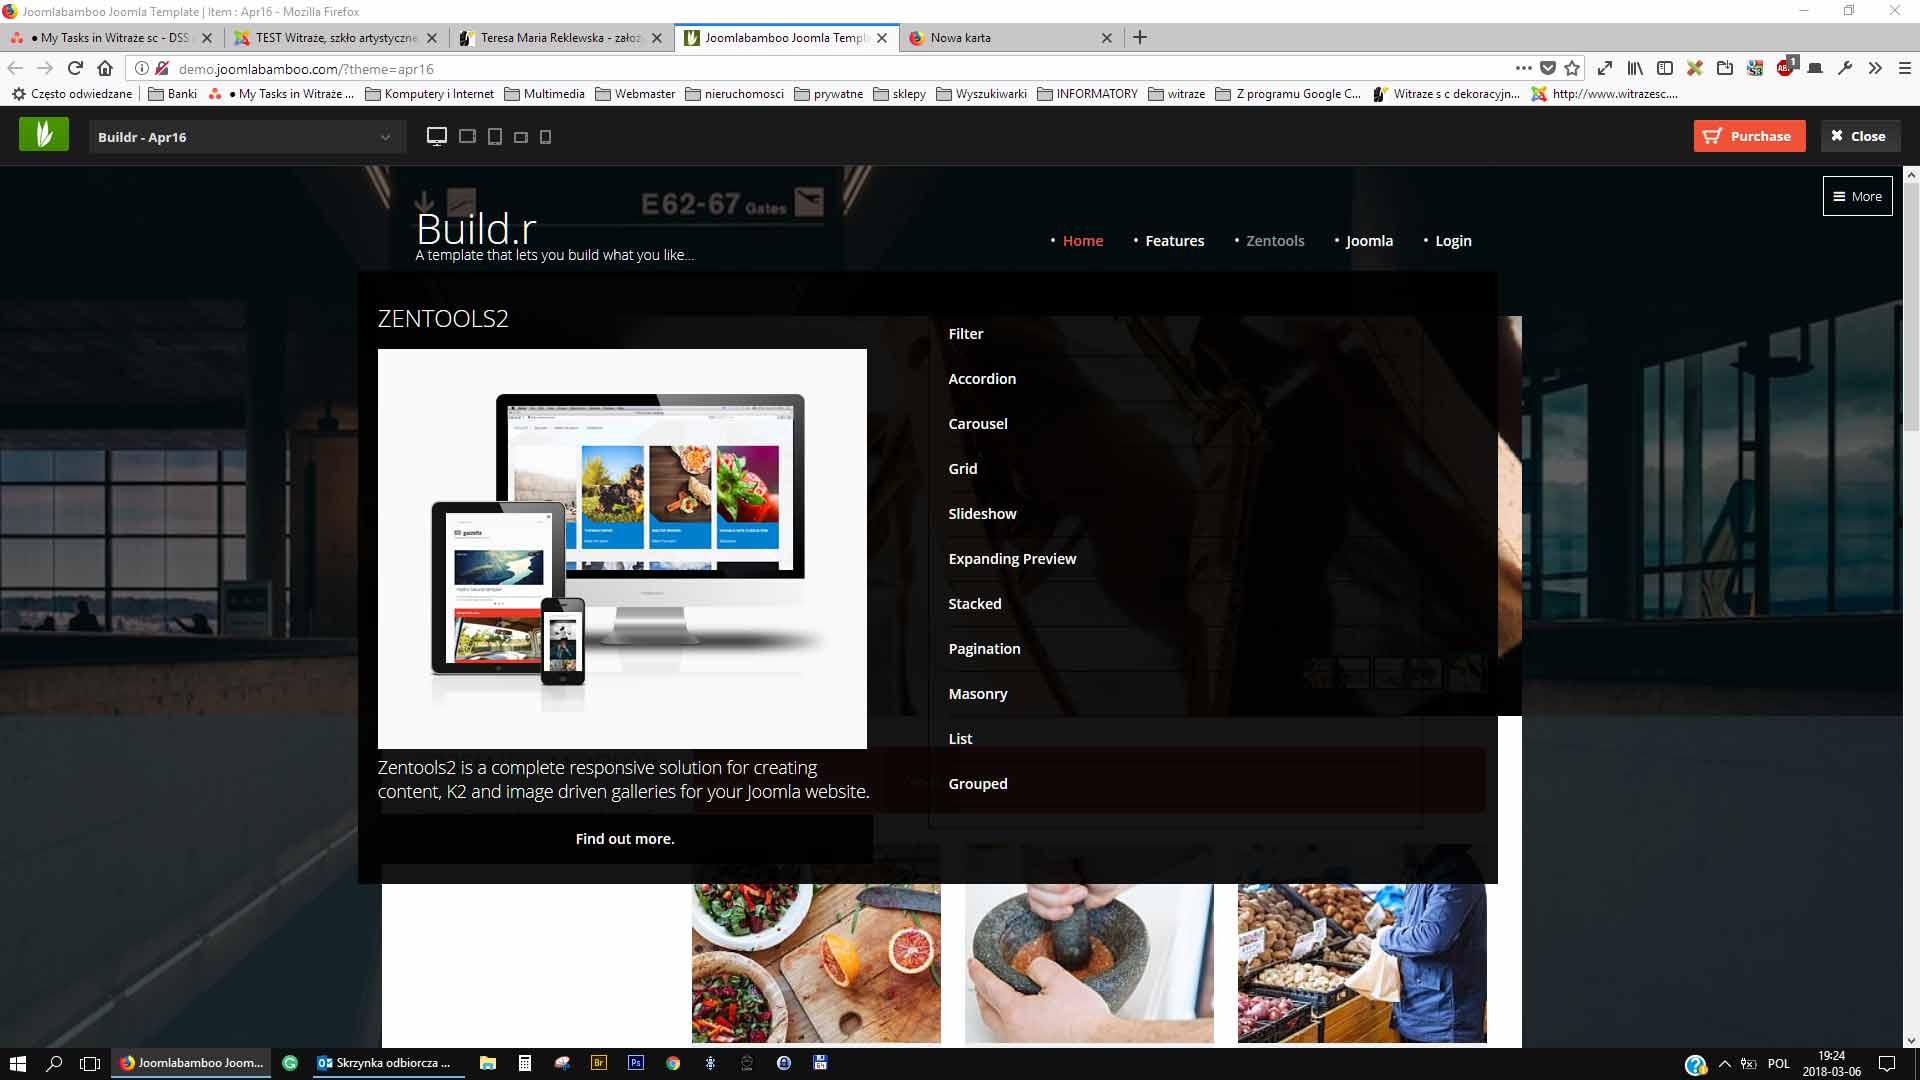 JB_Buildr_shifted_menu2.jpg